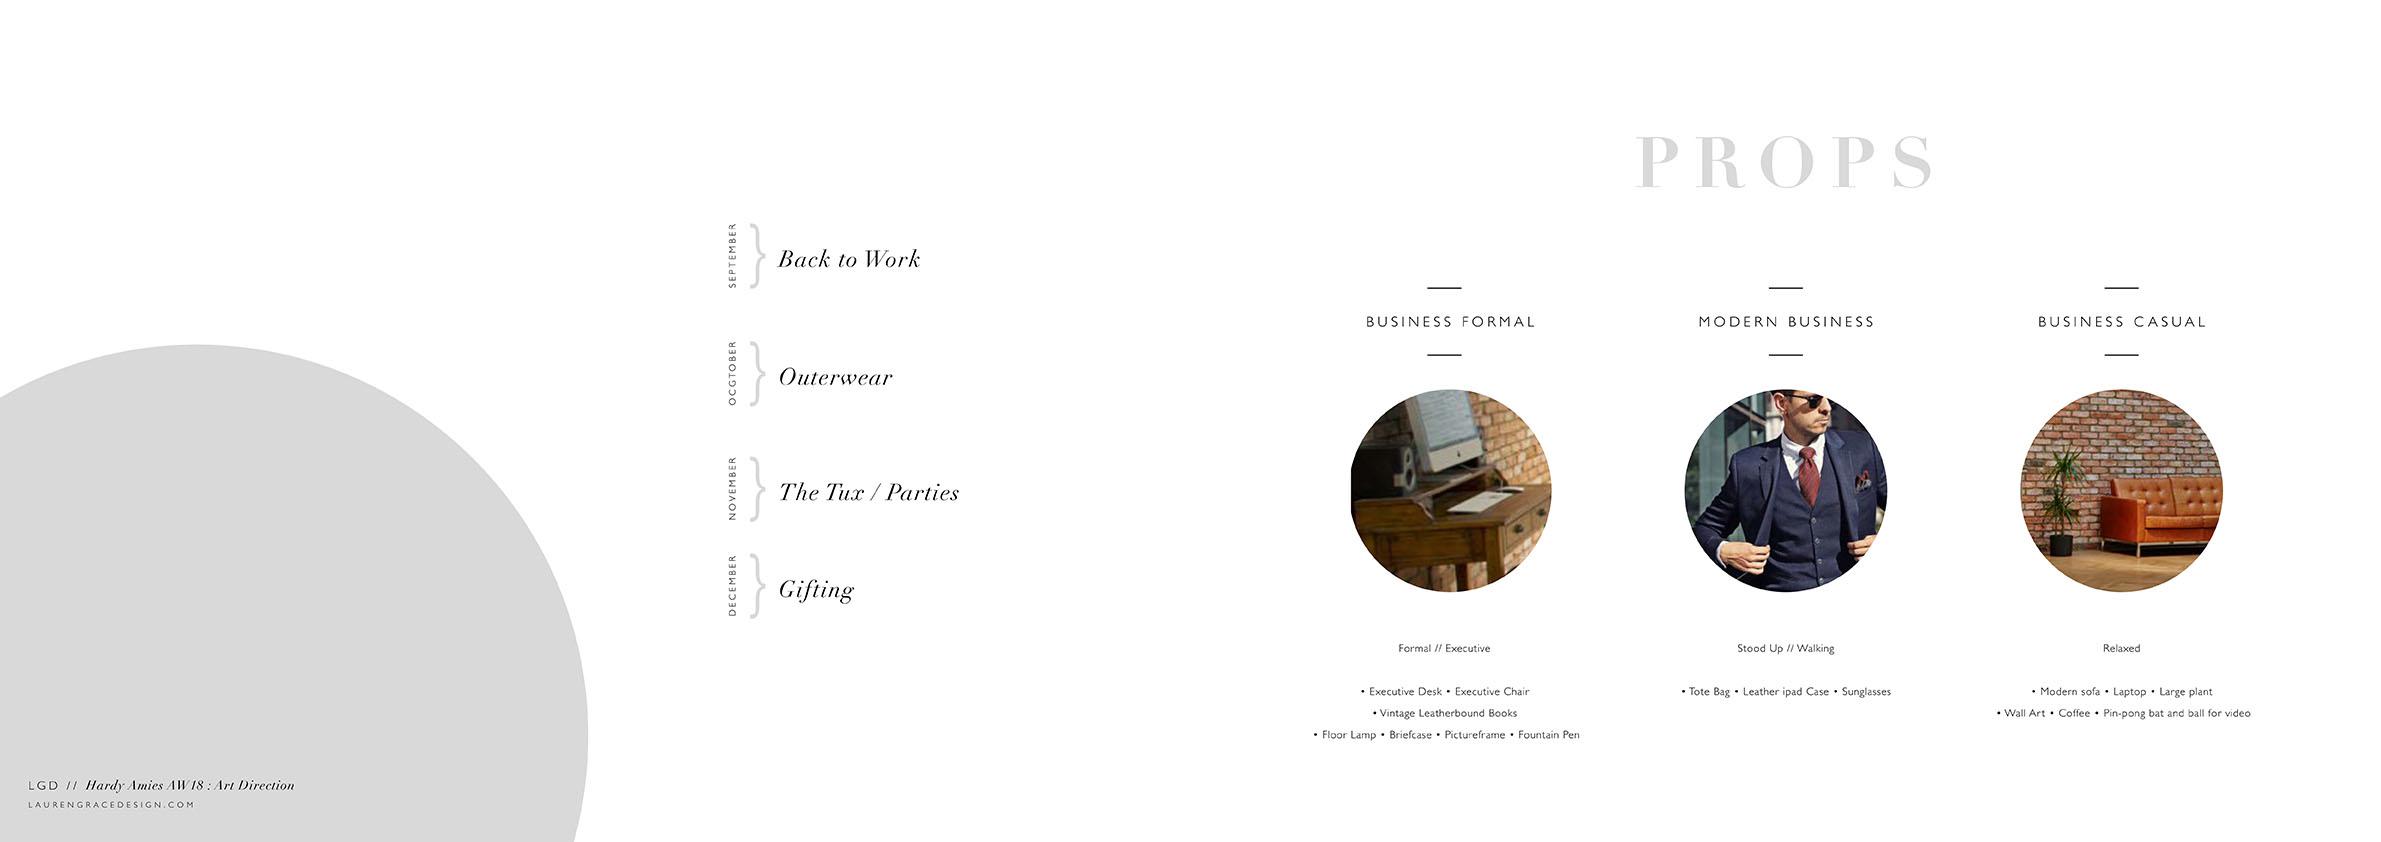 lauren-grace-design-freelance-london-art-direction-fashion-menswear-7.jpg